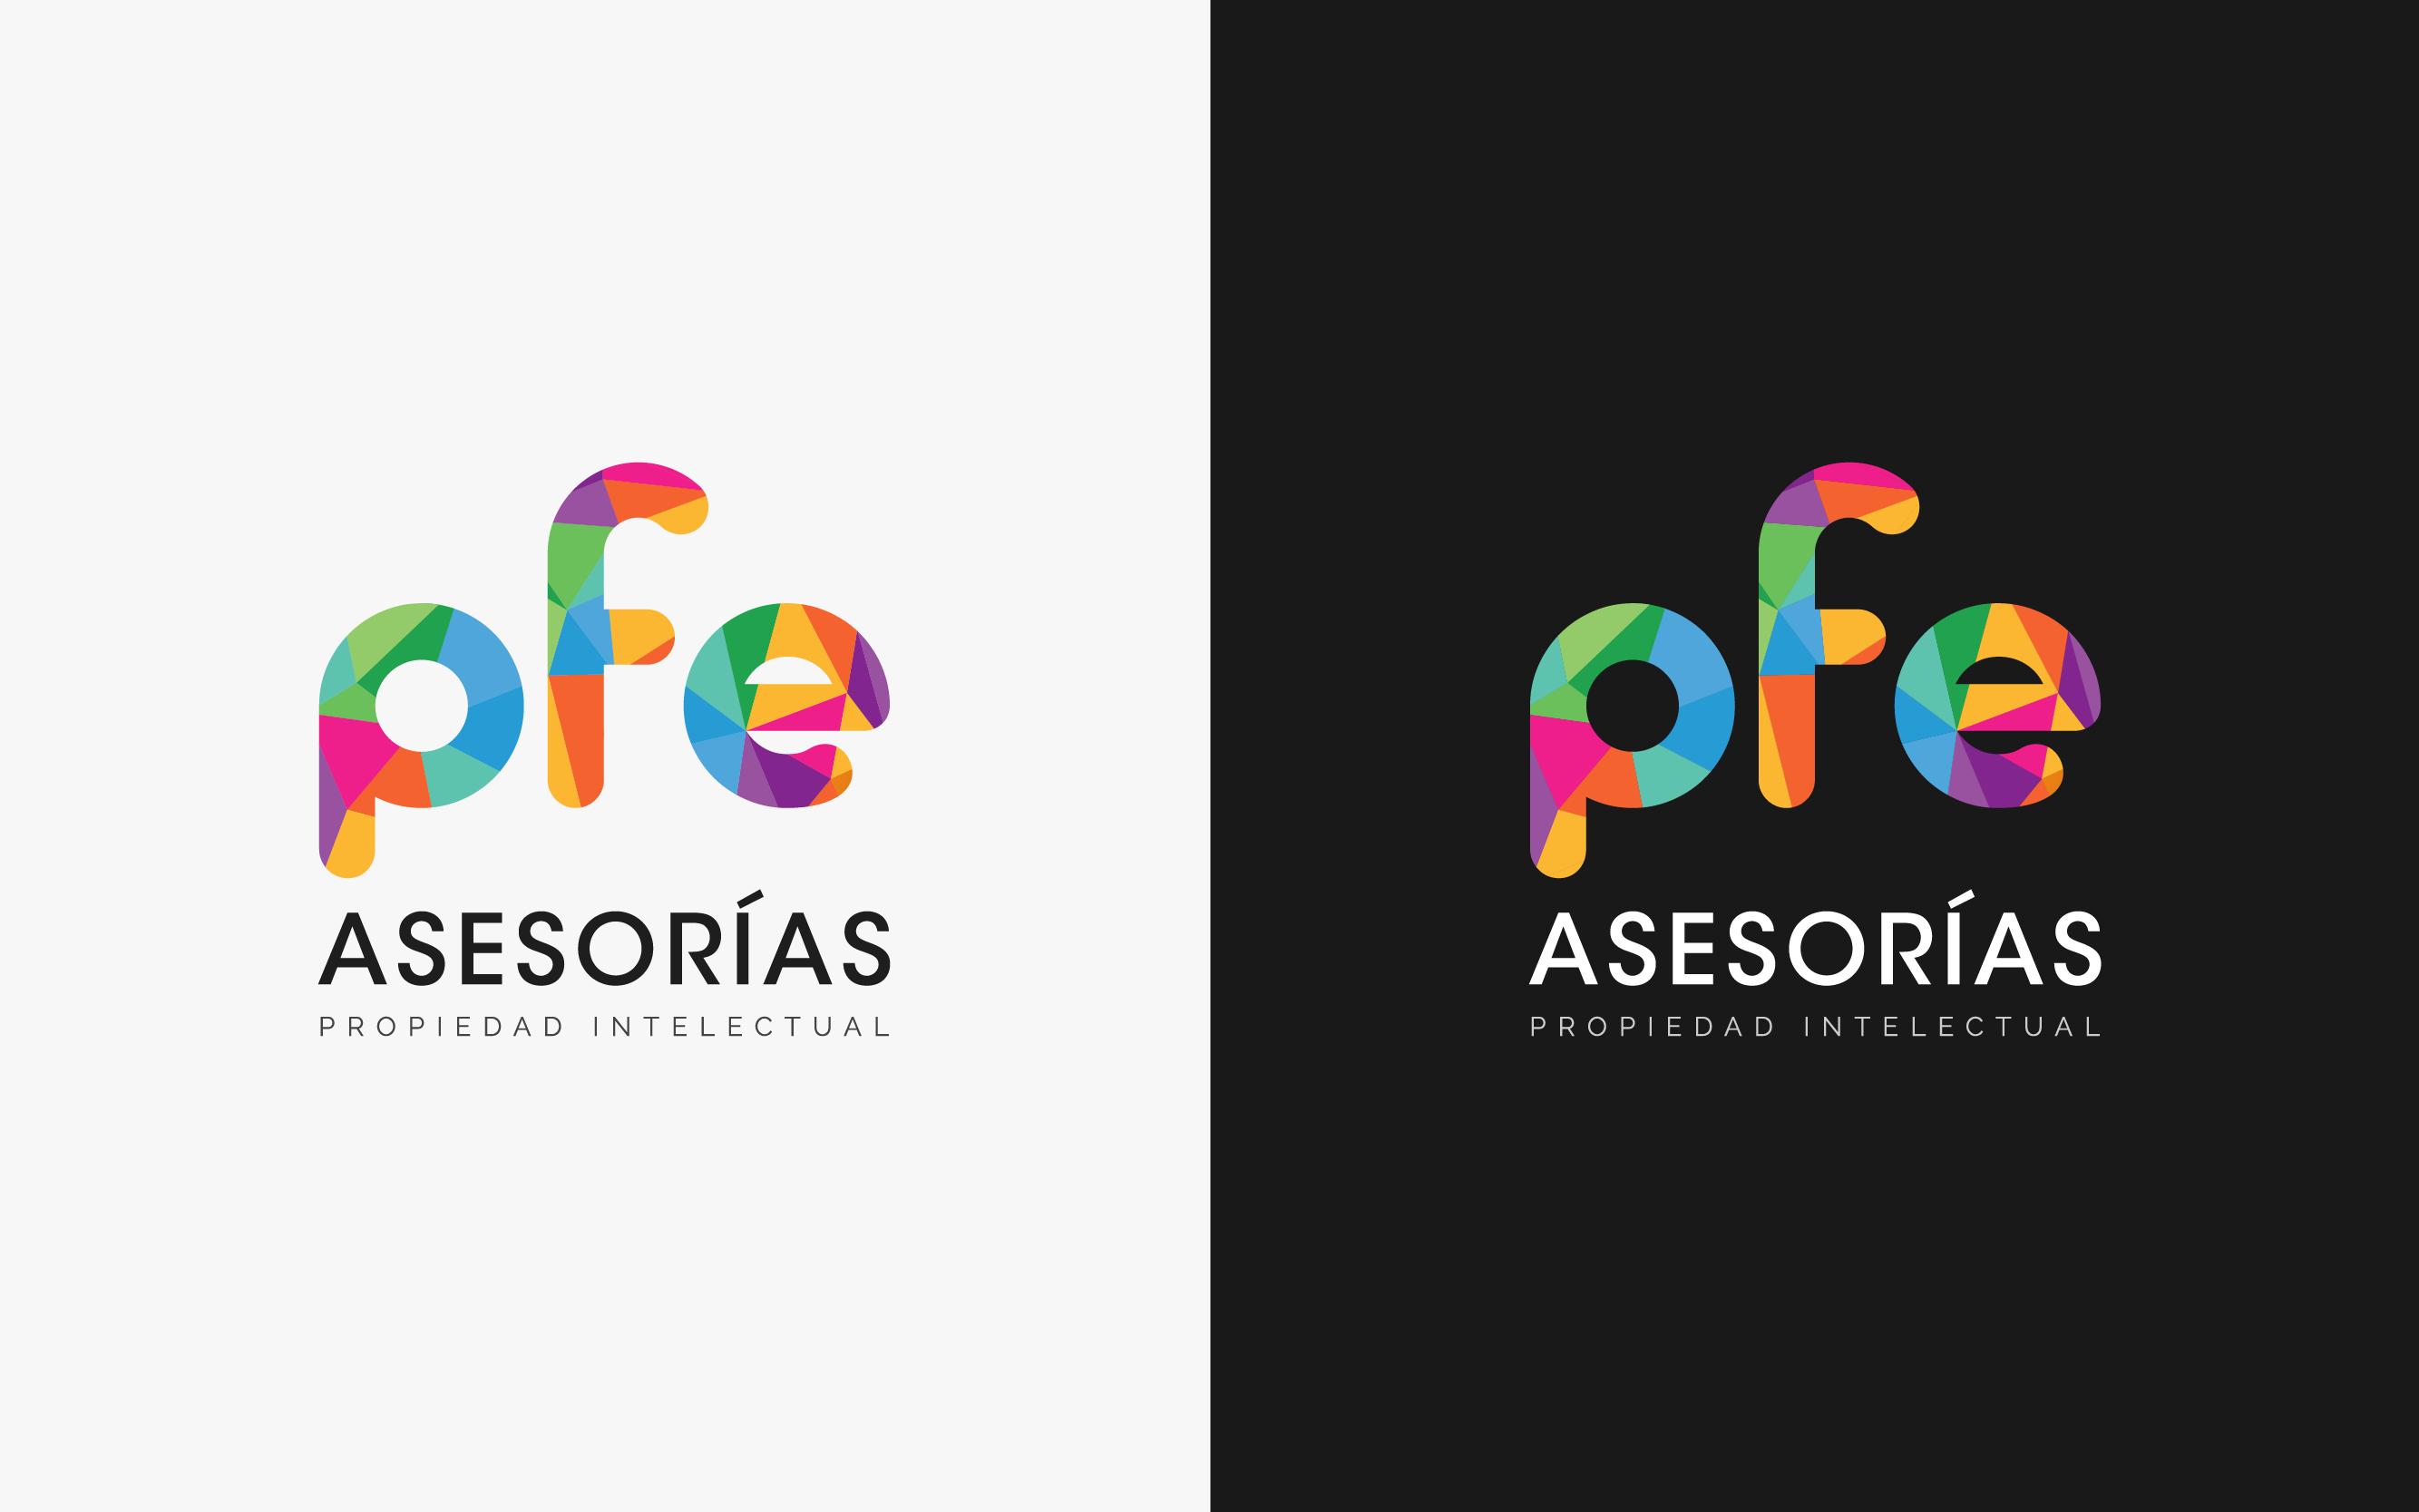 logo-pfe-3-01